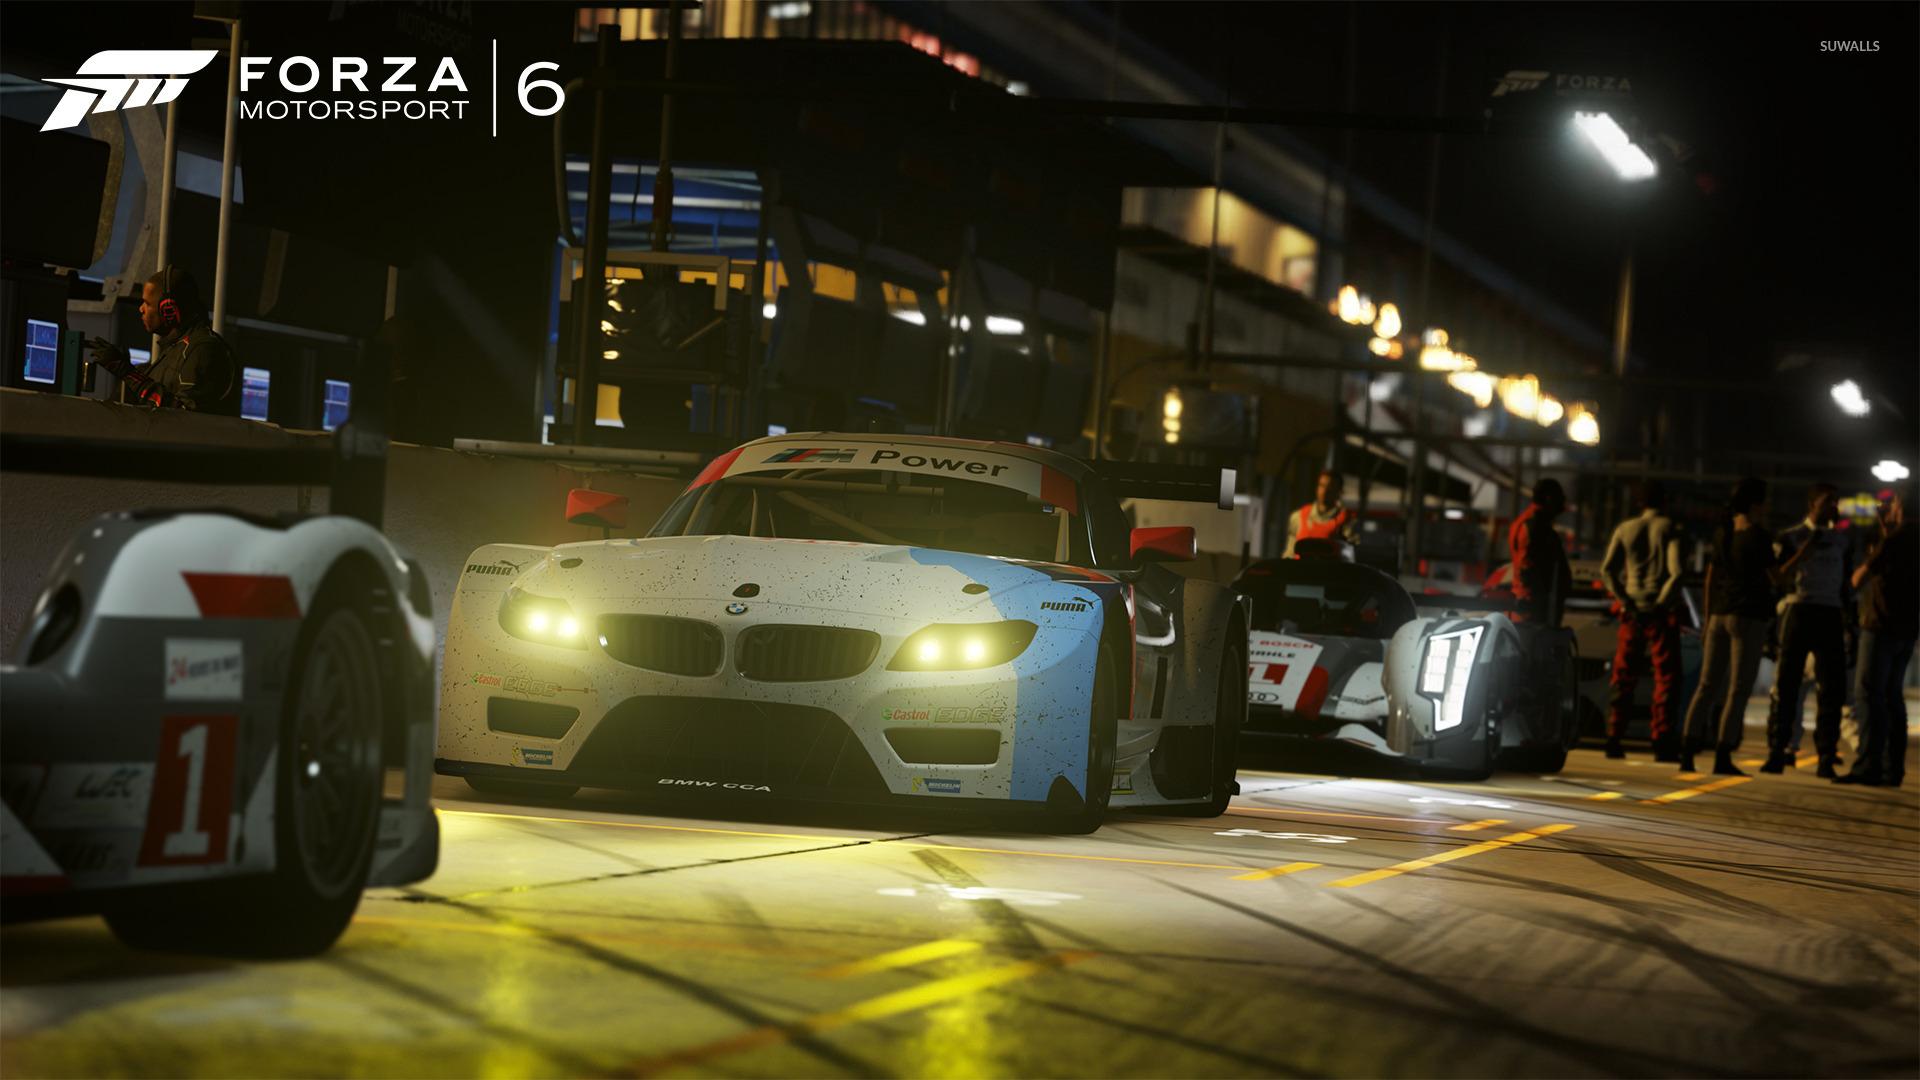 Forza Motorsport 6 6 Wallpaper Game Wallpapers 44849